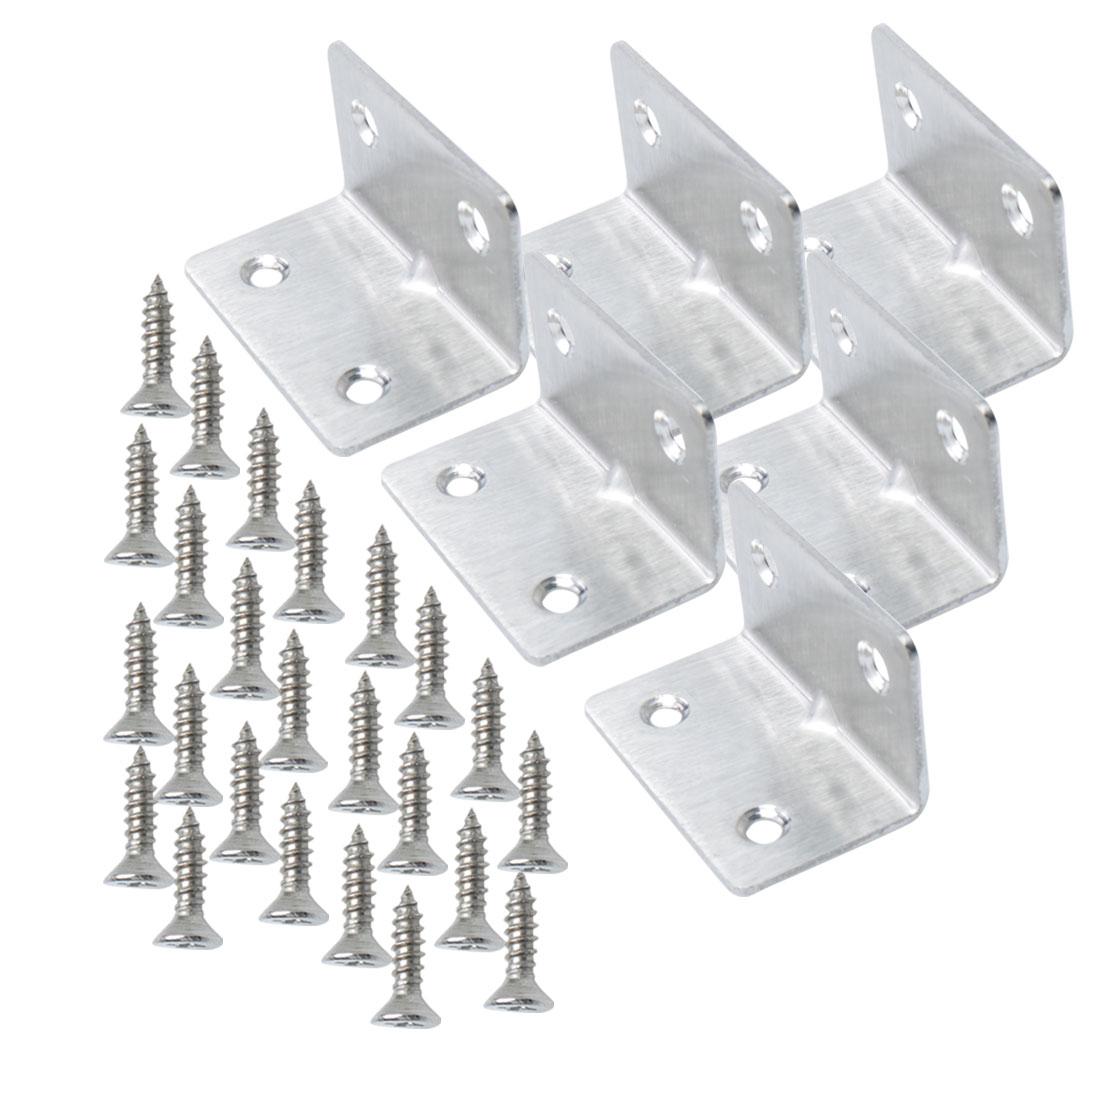 Angle Bracket Stainless Steel Corner Brace Shelf Support w Screw 30 x 30mm, 6pcs